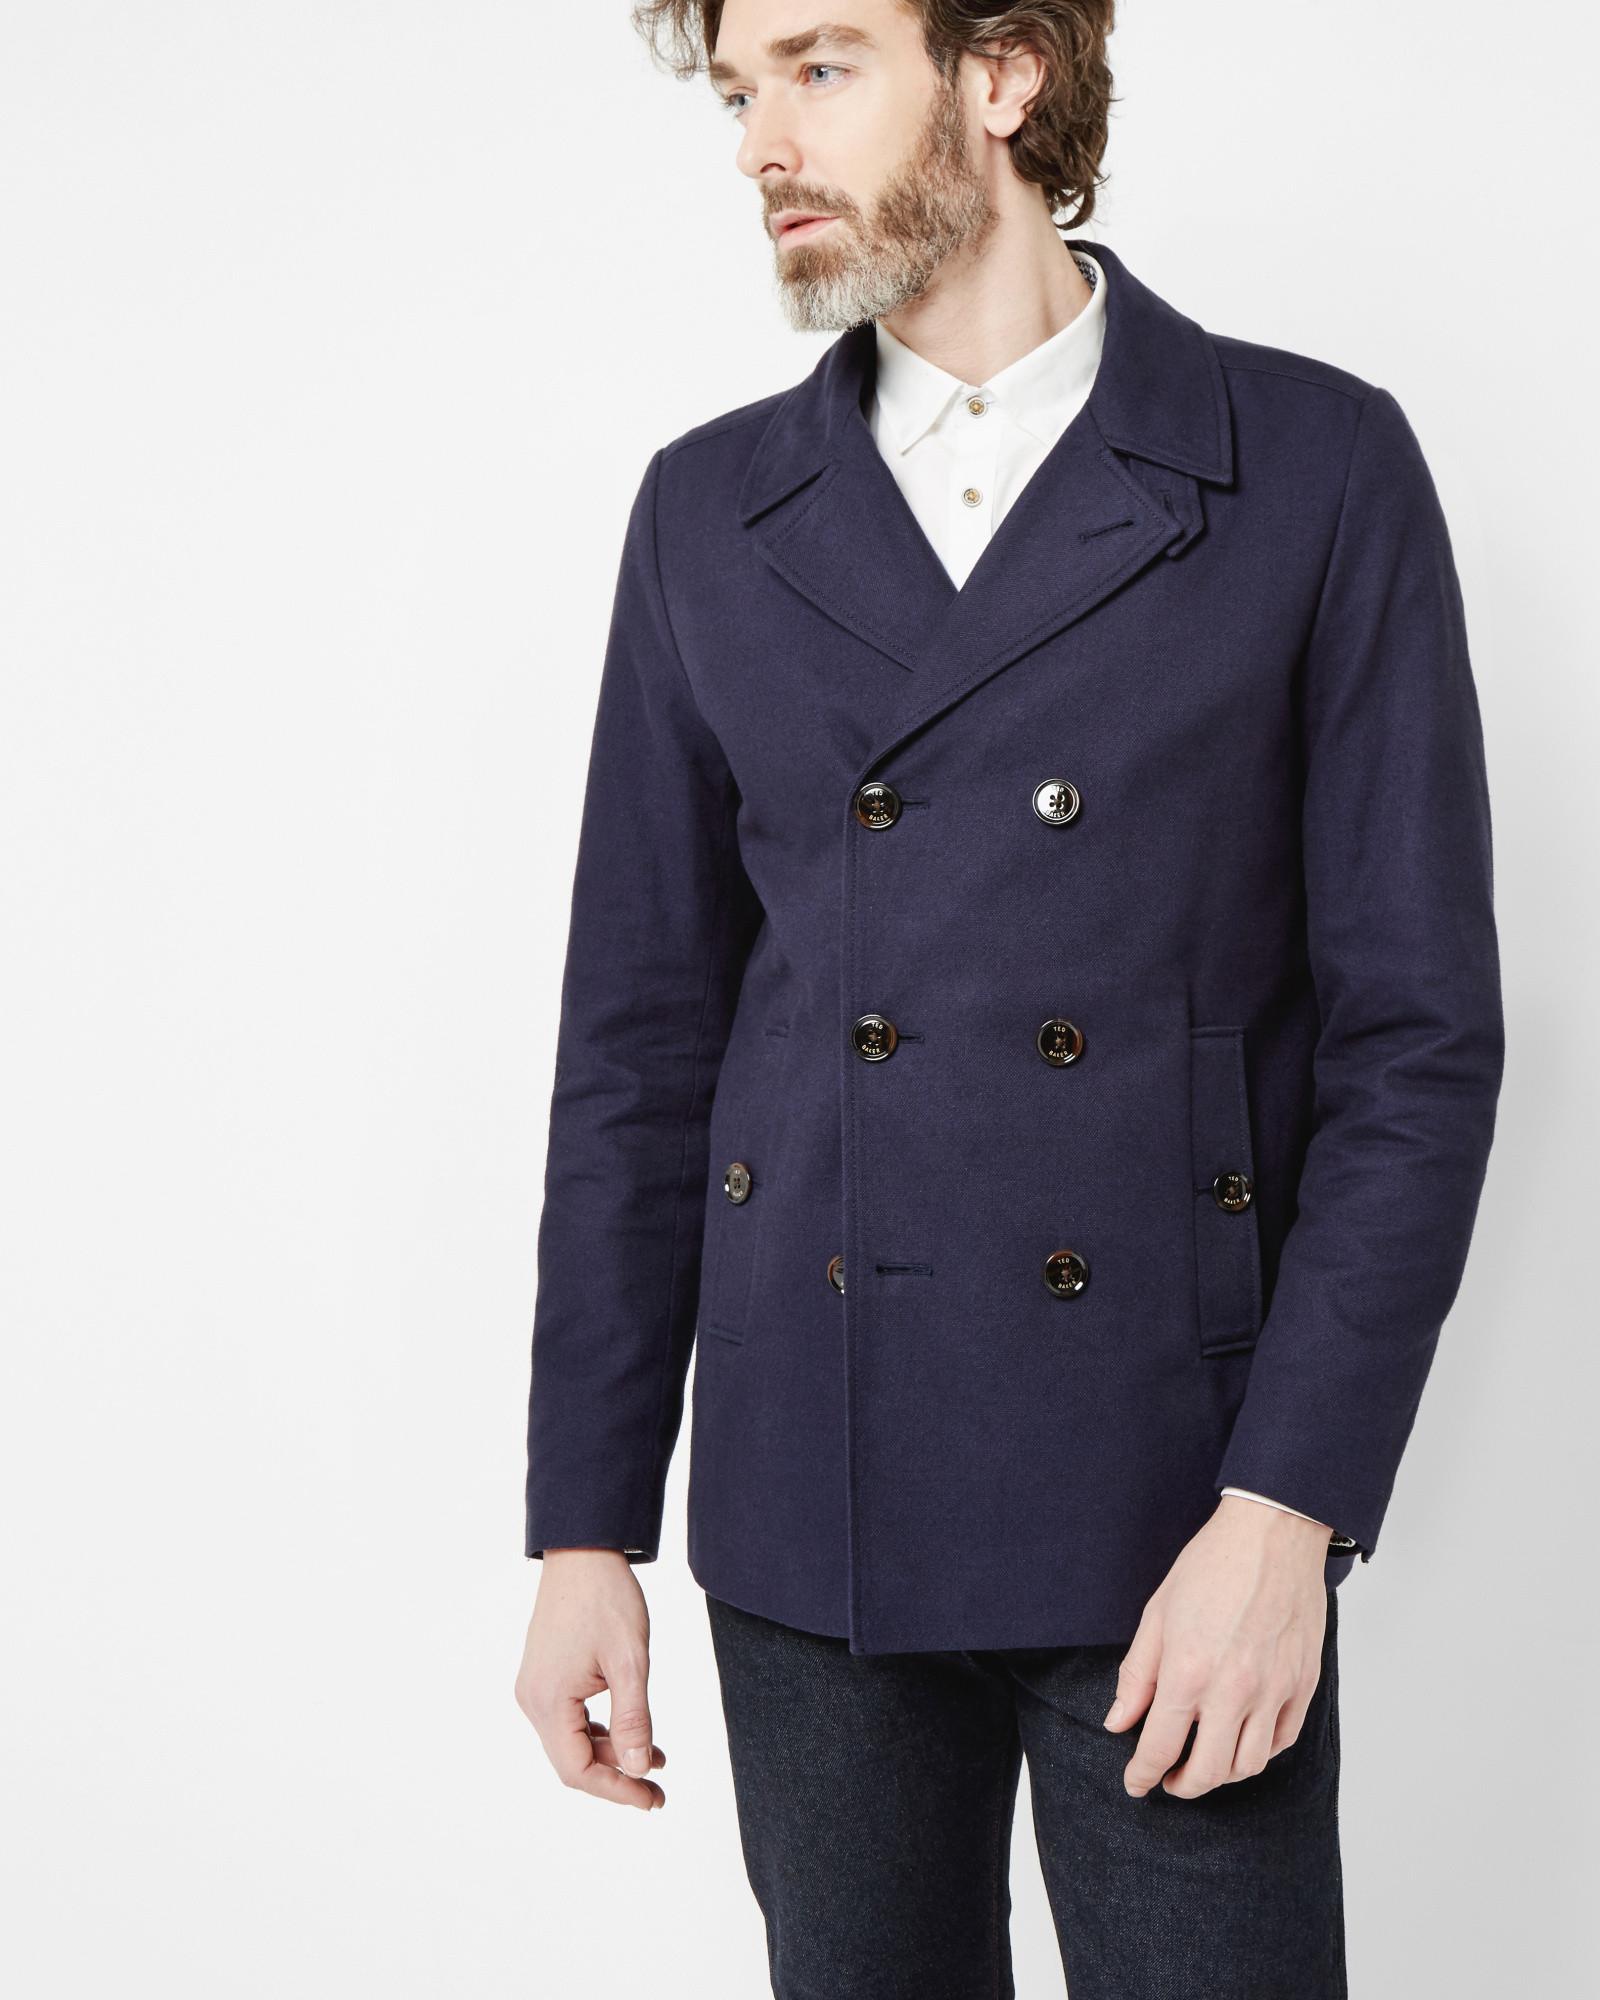 Cotton Pea Coat Promotions, Black Cotton Pea Coat